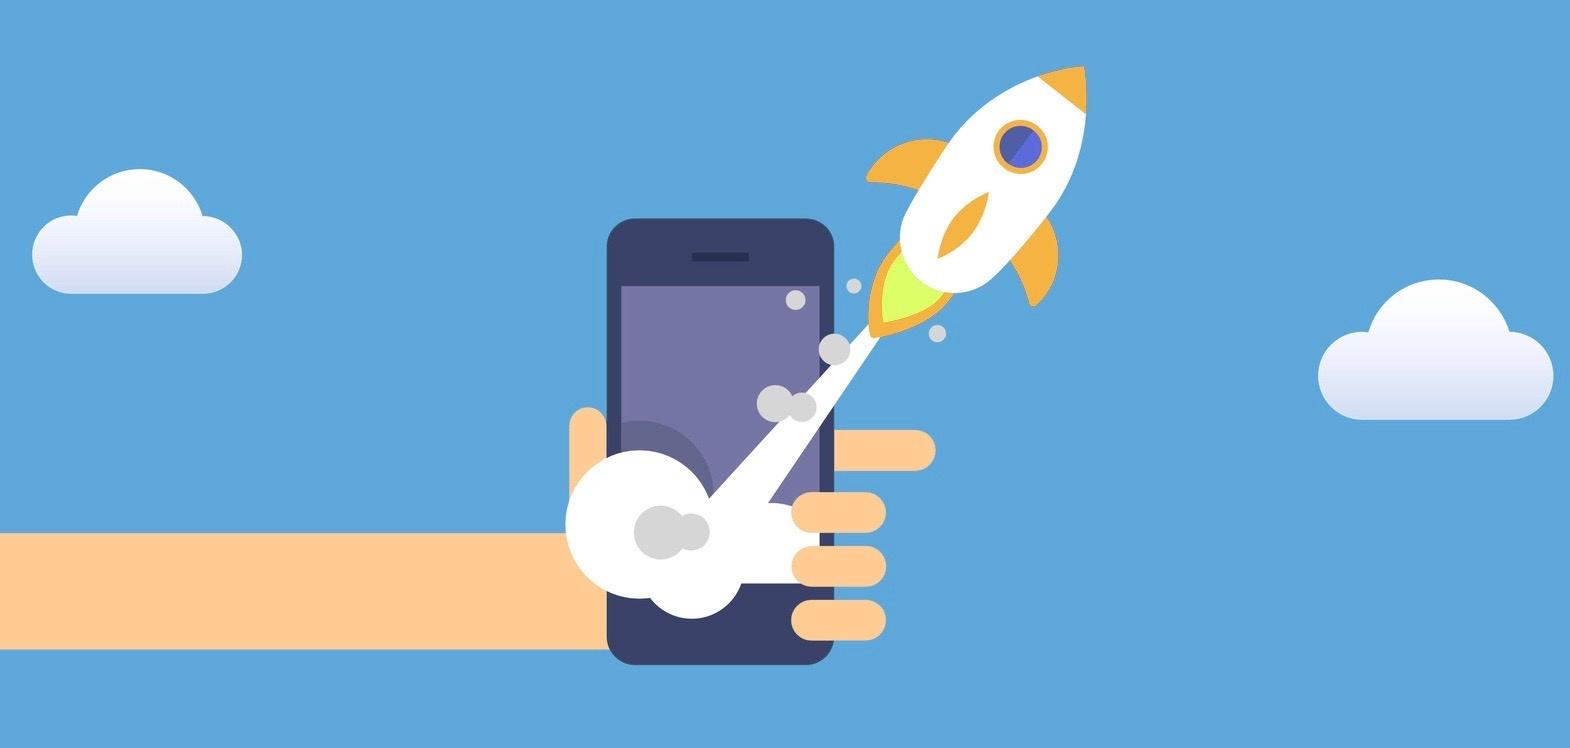 rakete-smarthone-app-orange